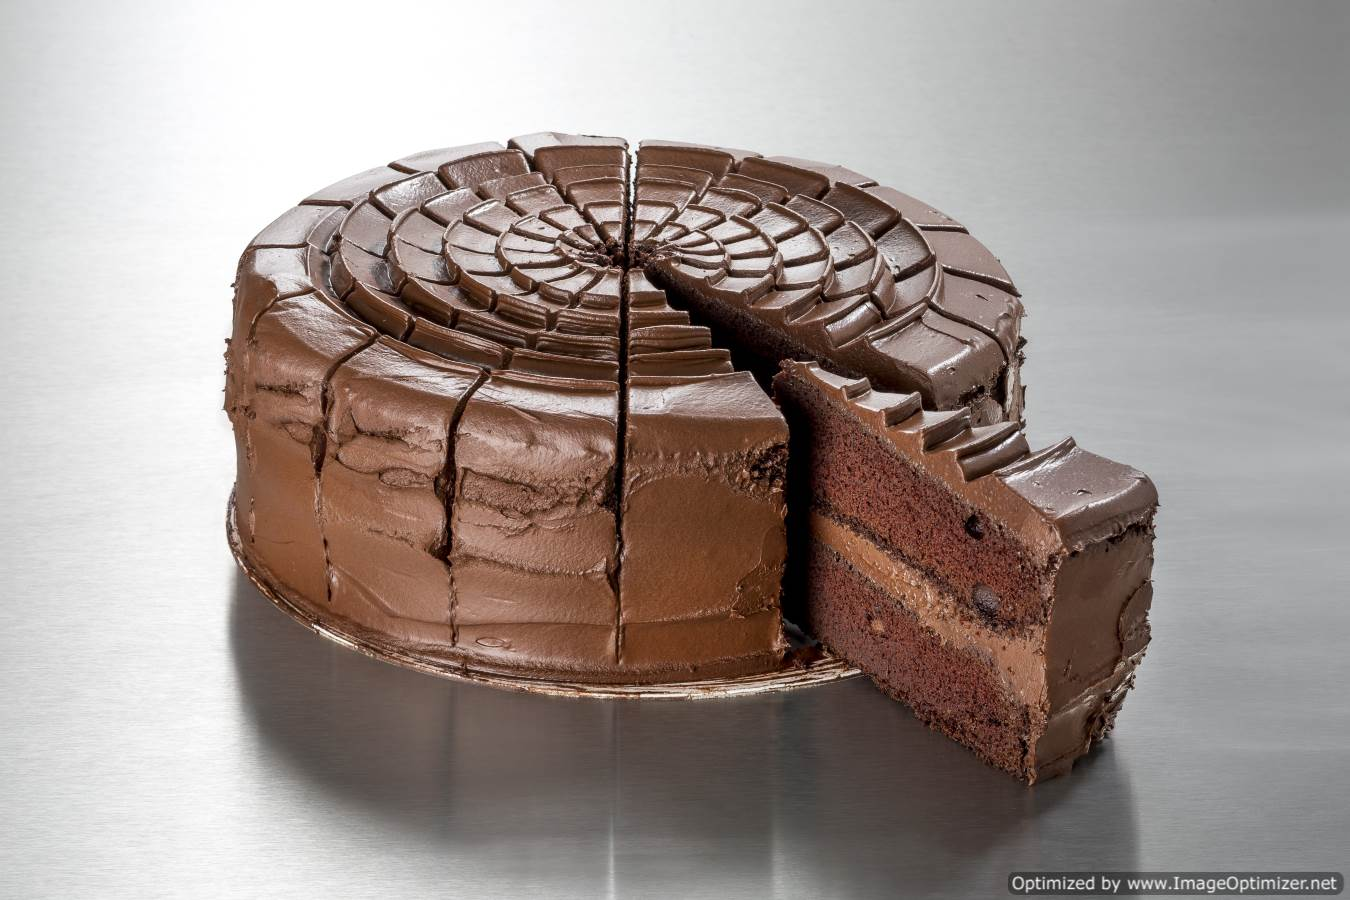 Desserts, Cakes & Creams